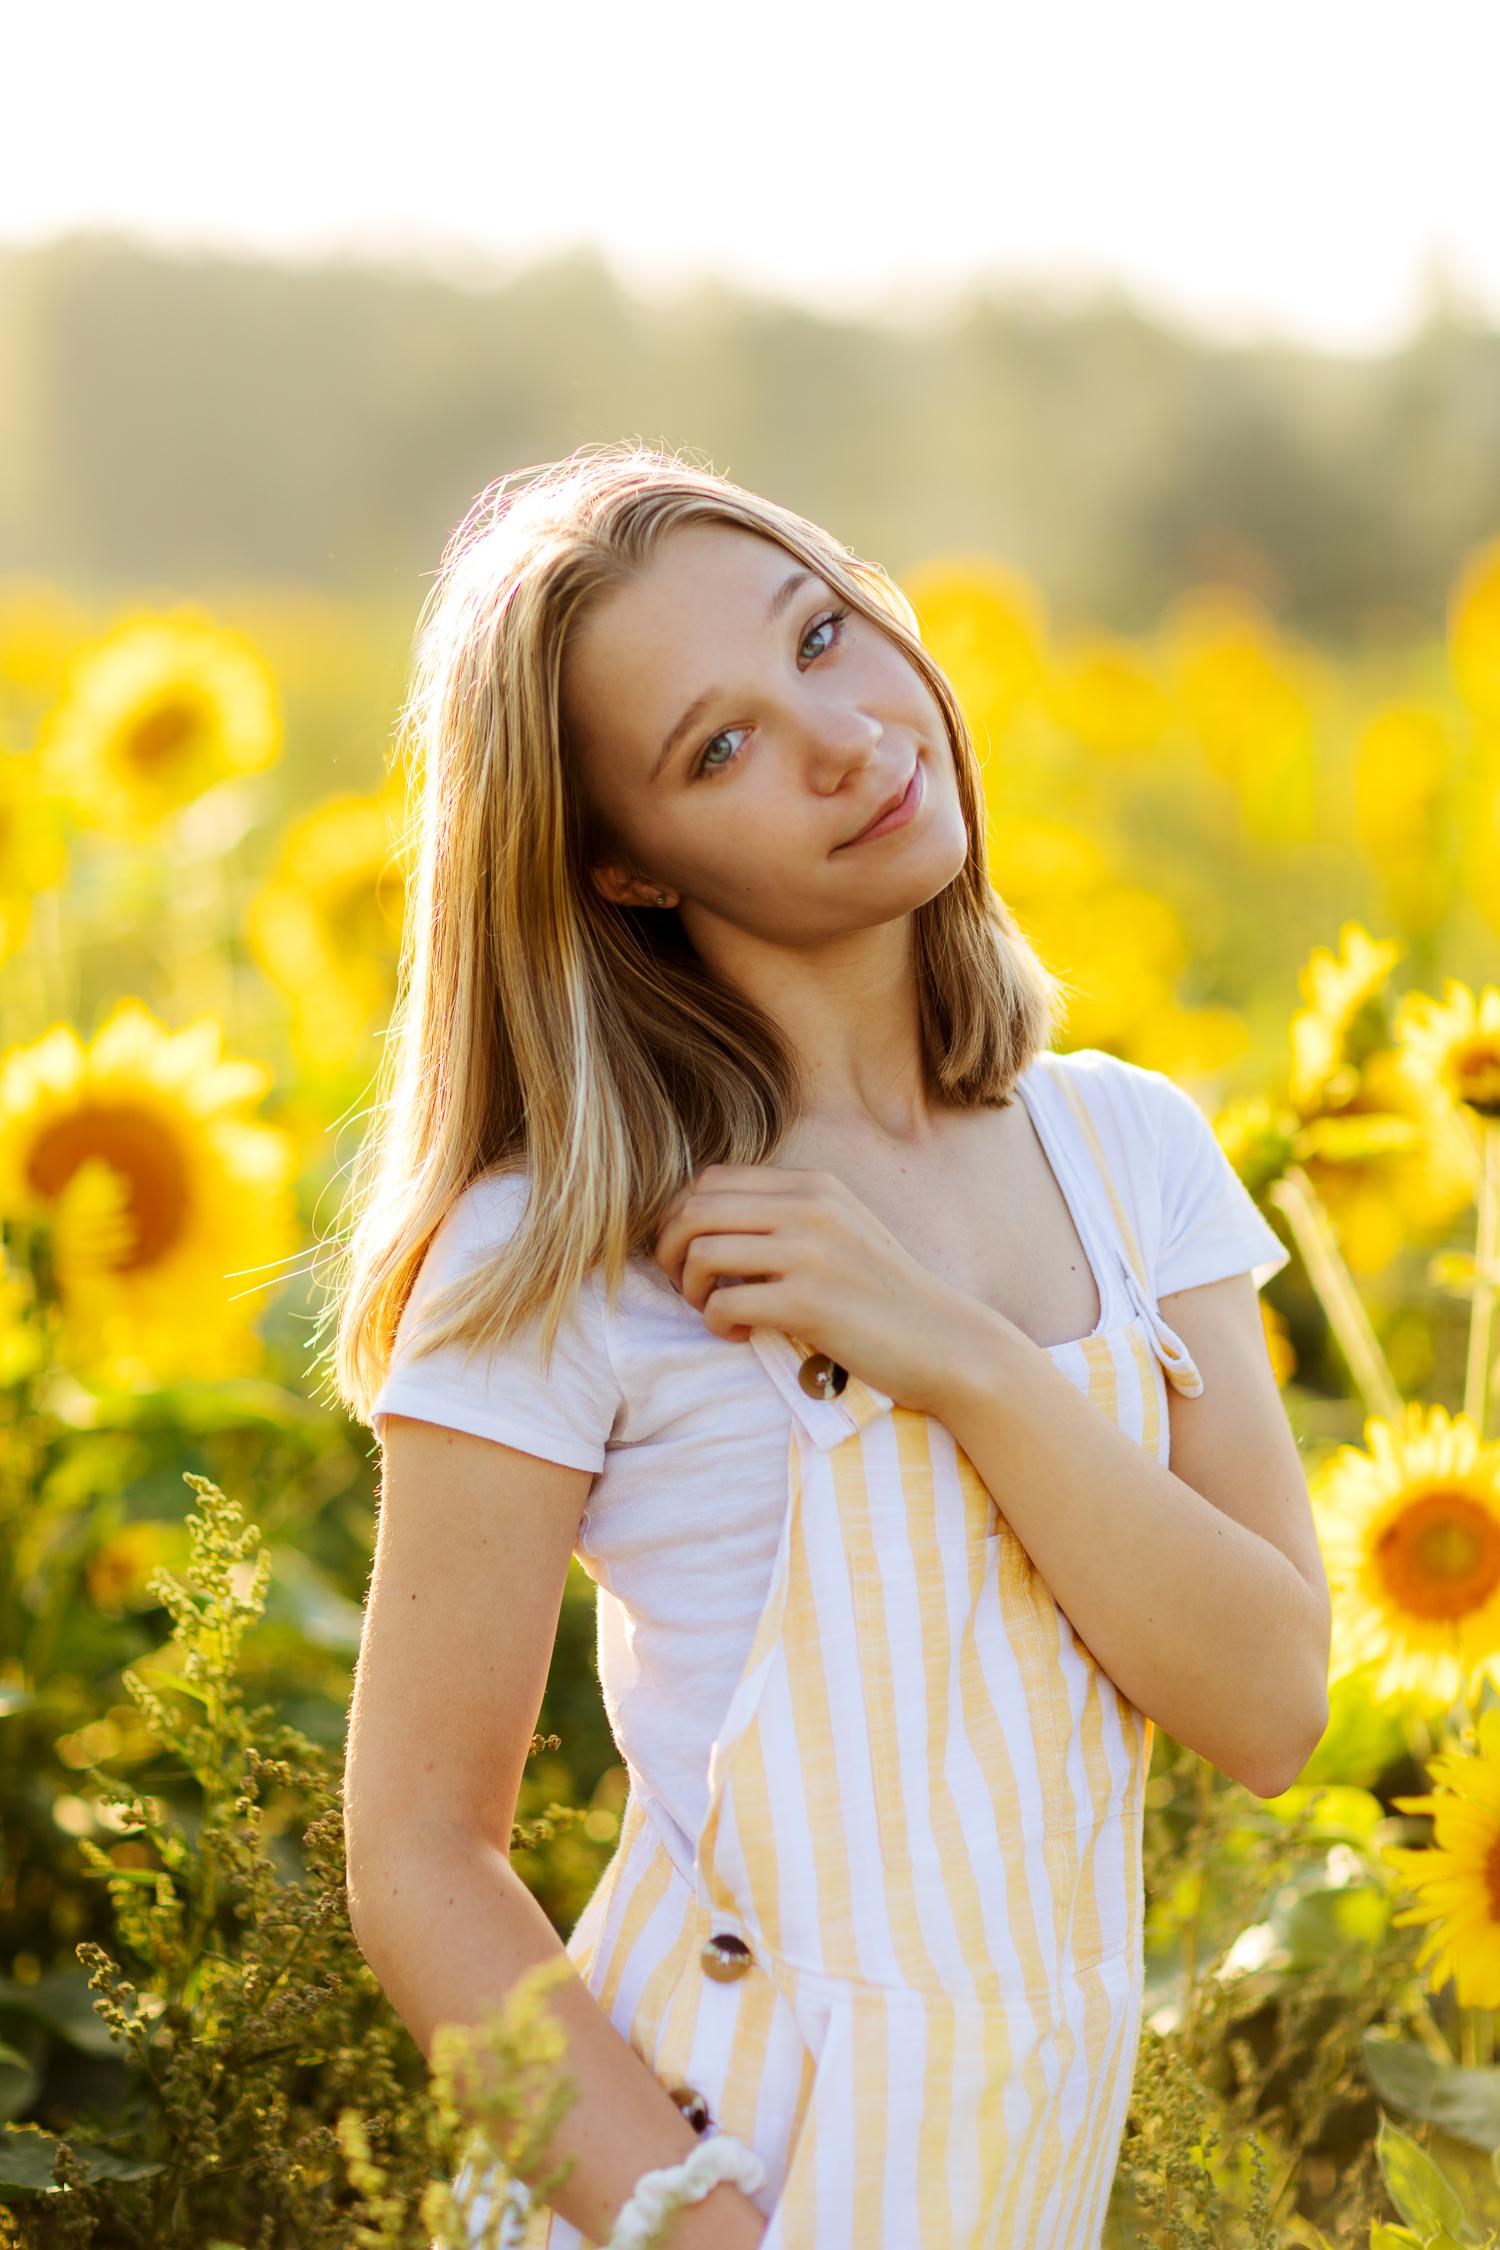 ariellanoellephotography-portraiture-highschool-senior-photos-top-seattle-area-photographer-1-3.jpg